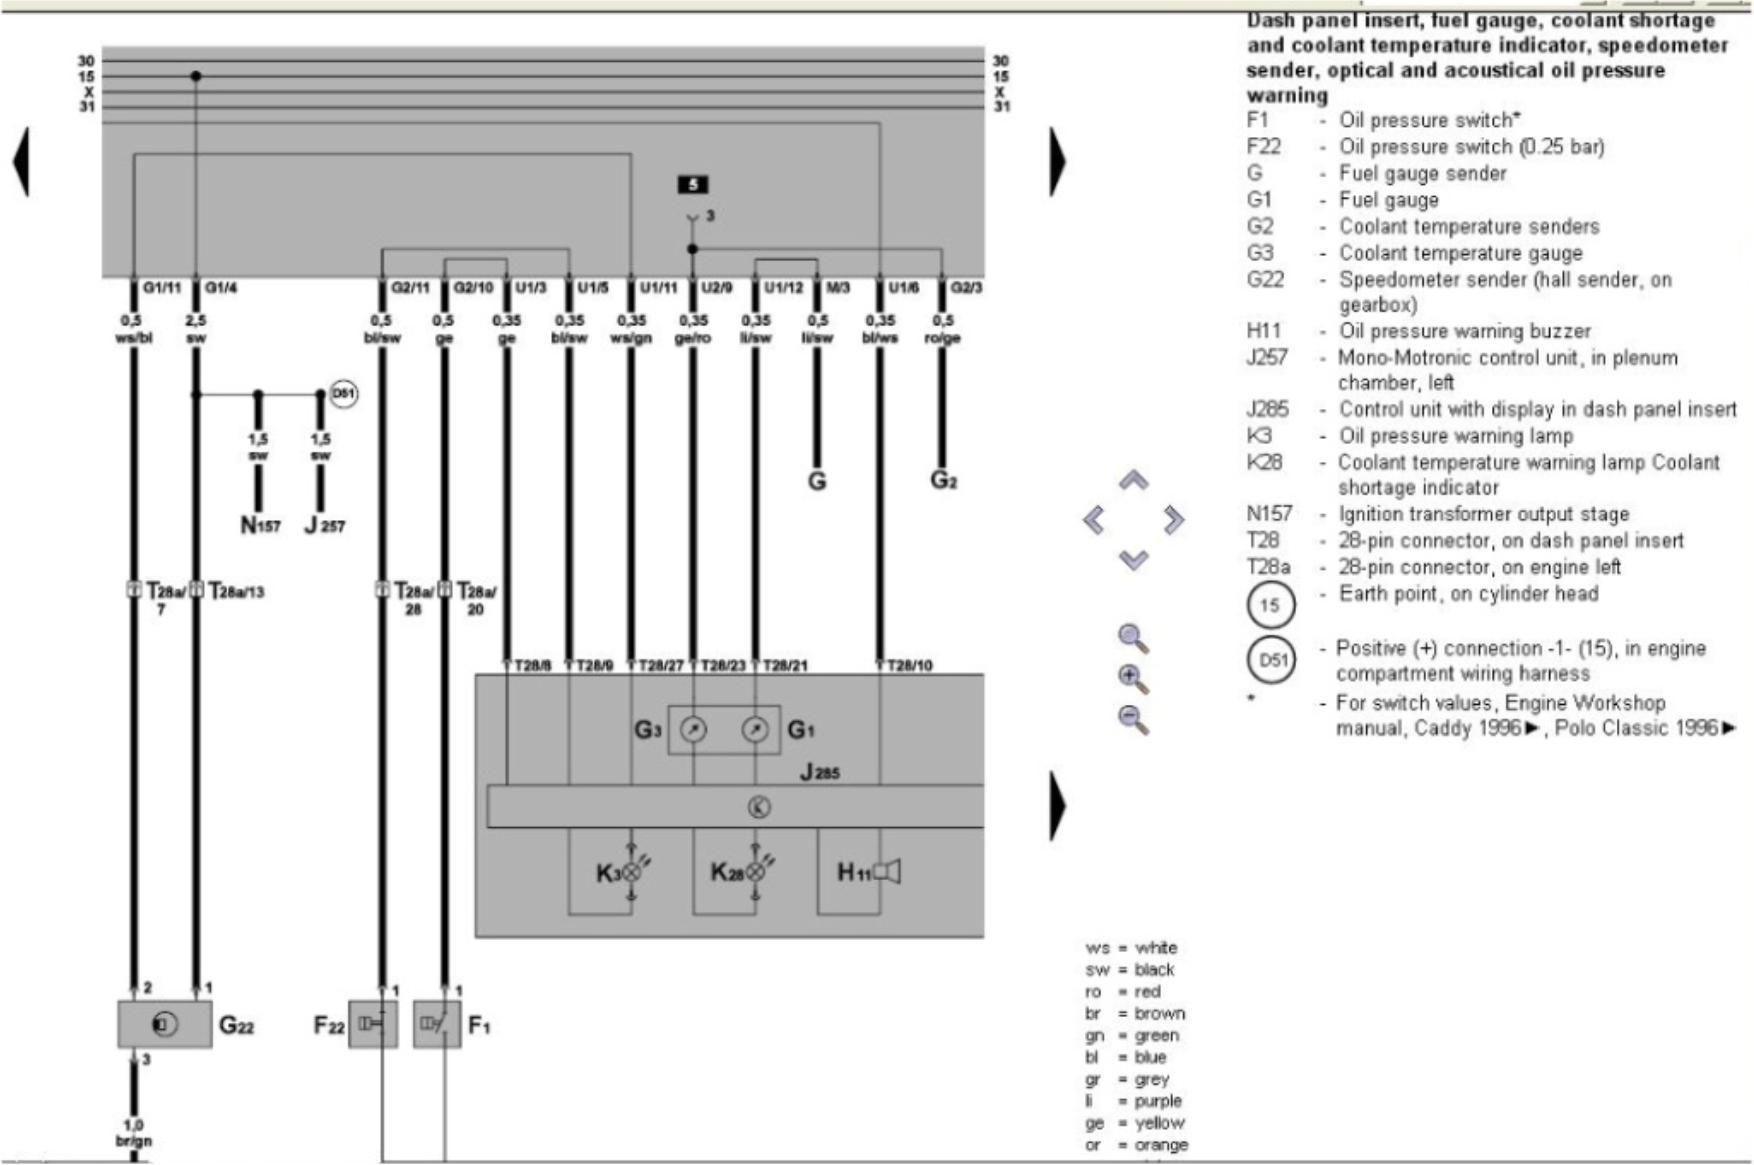 1996 vw wiring diagram van dashboard 1 9 sdi thank you reg graphic graphic graphic graphic graphic